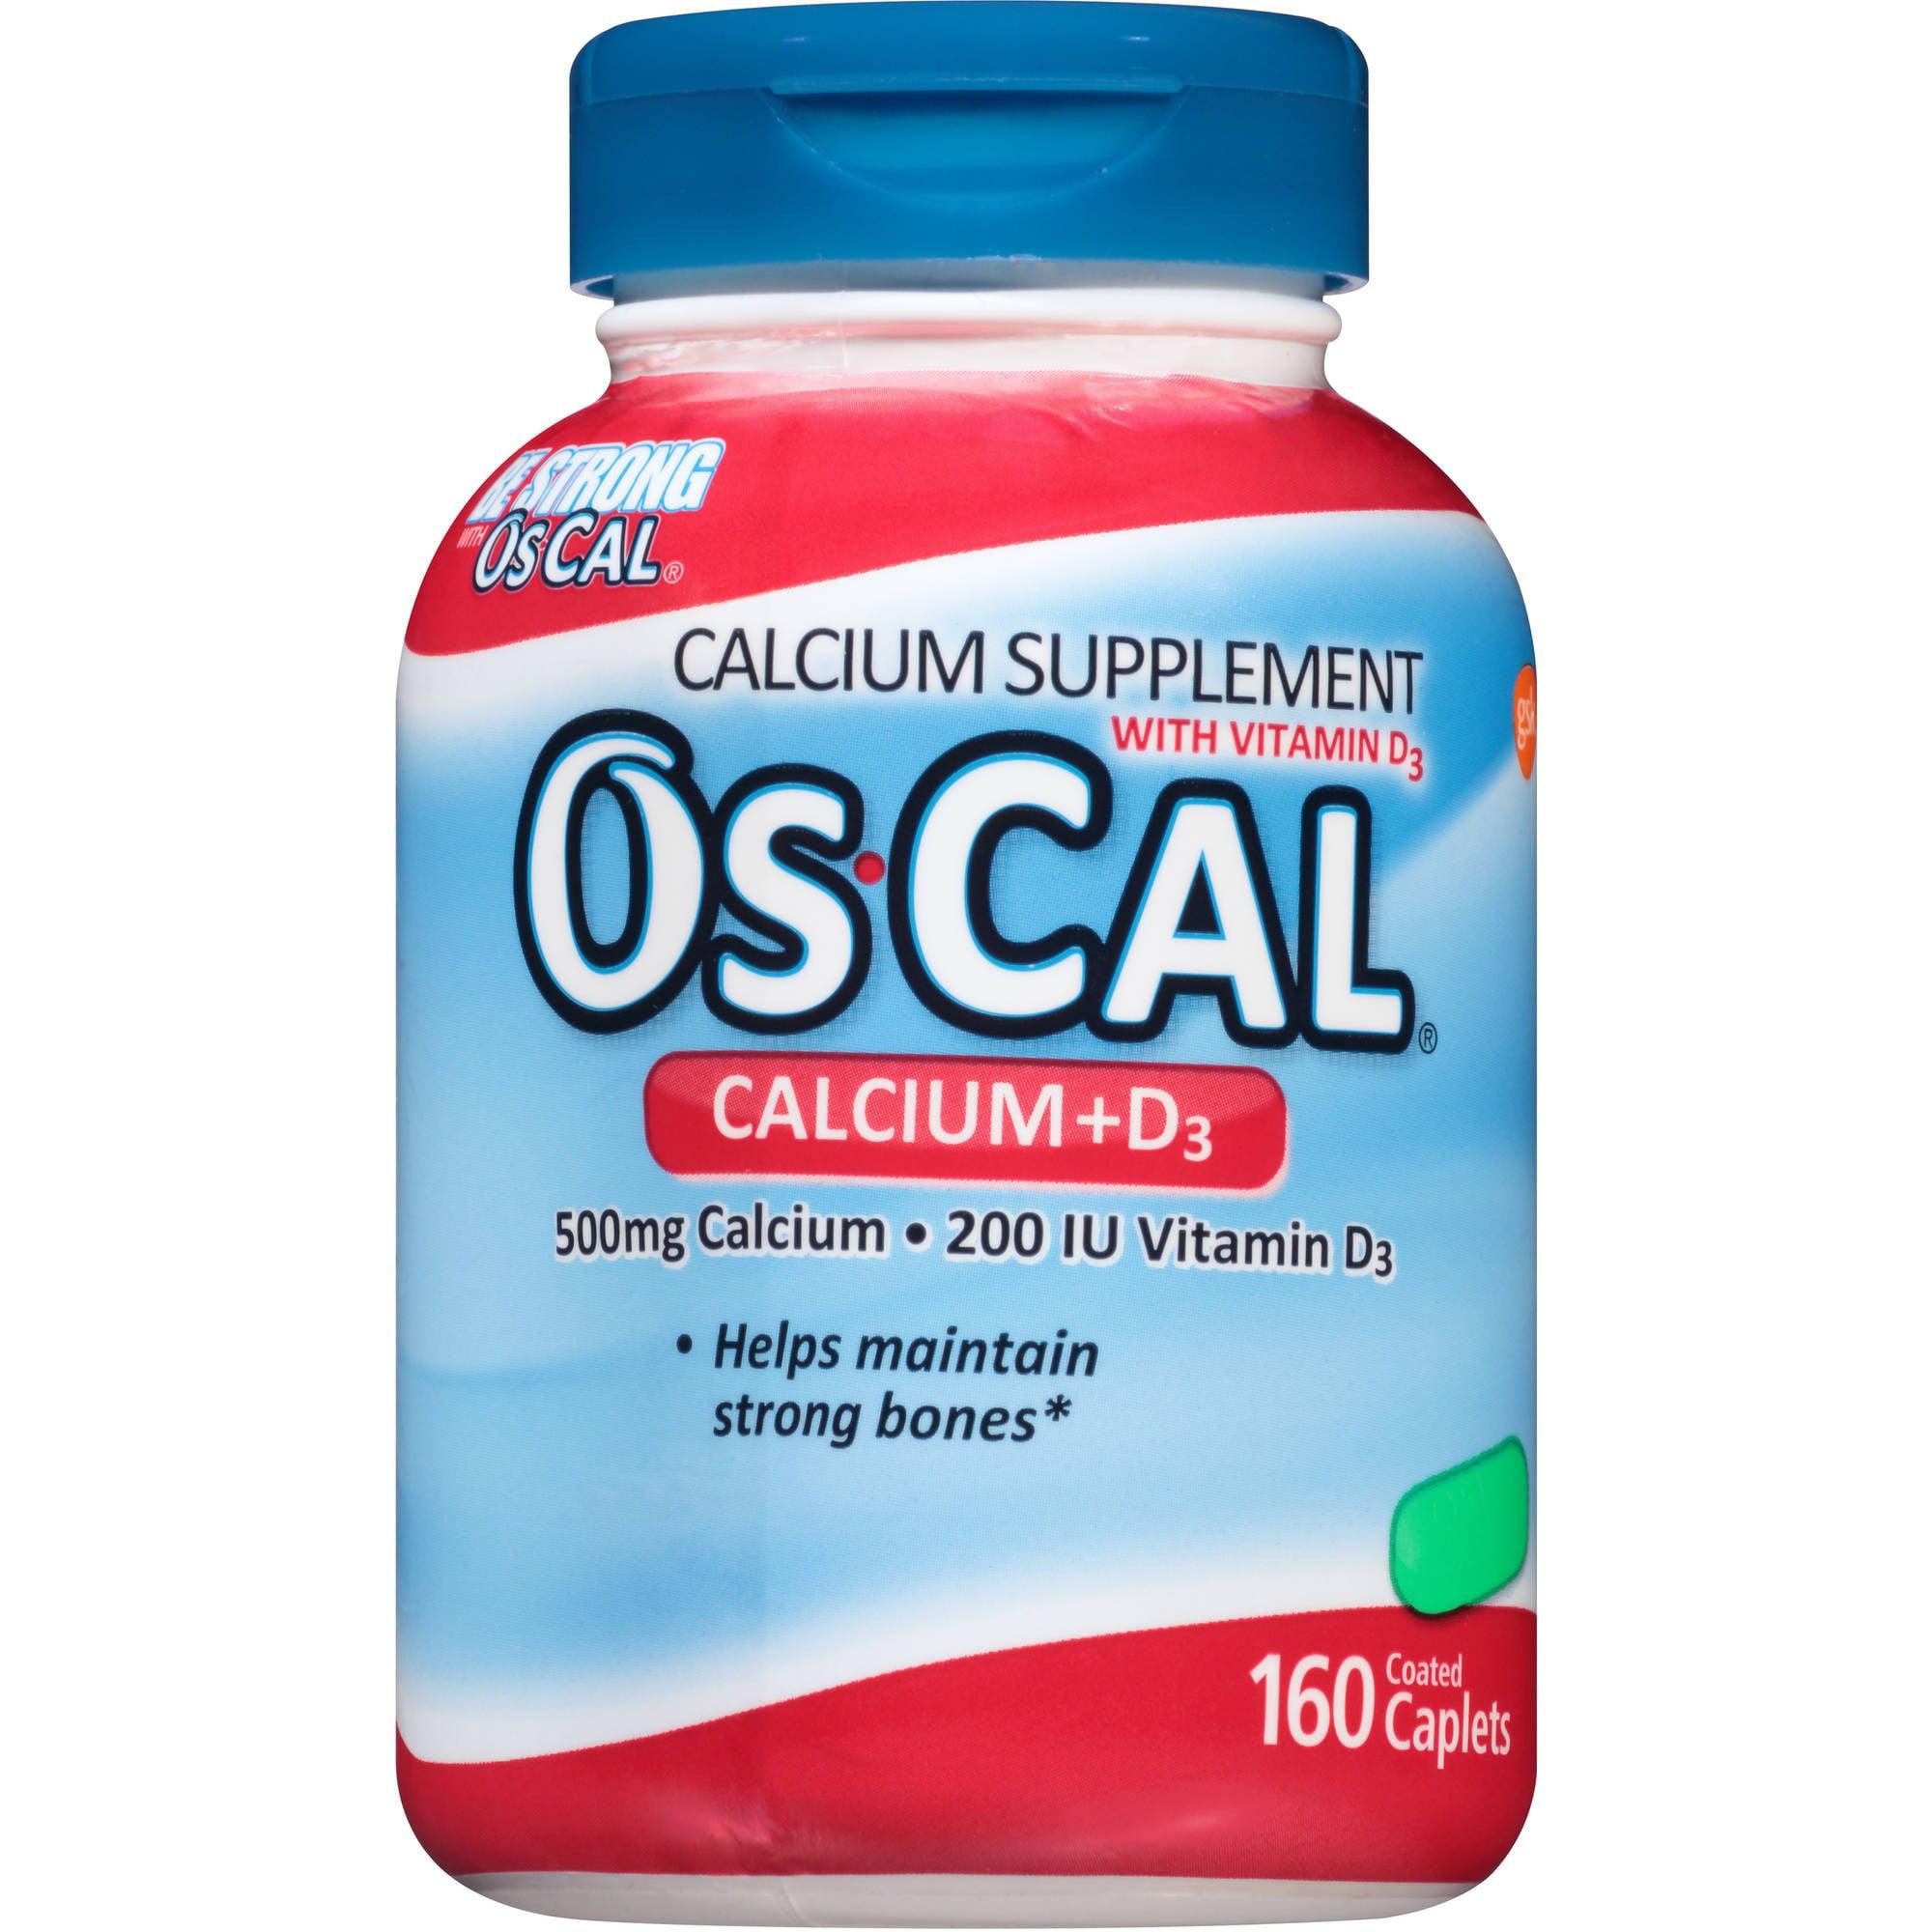 OsCal 500 mg Calcium + 200 IU Vitamin D3 Caplets Calcium Supplement, 160 count